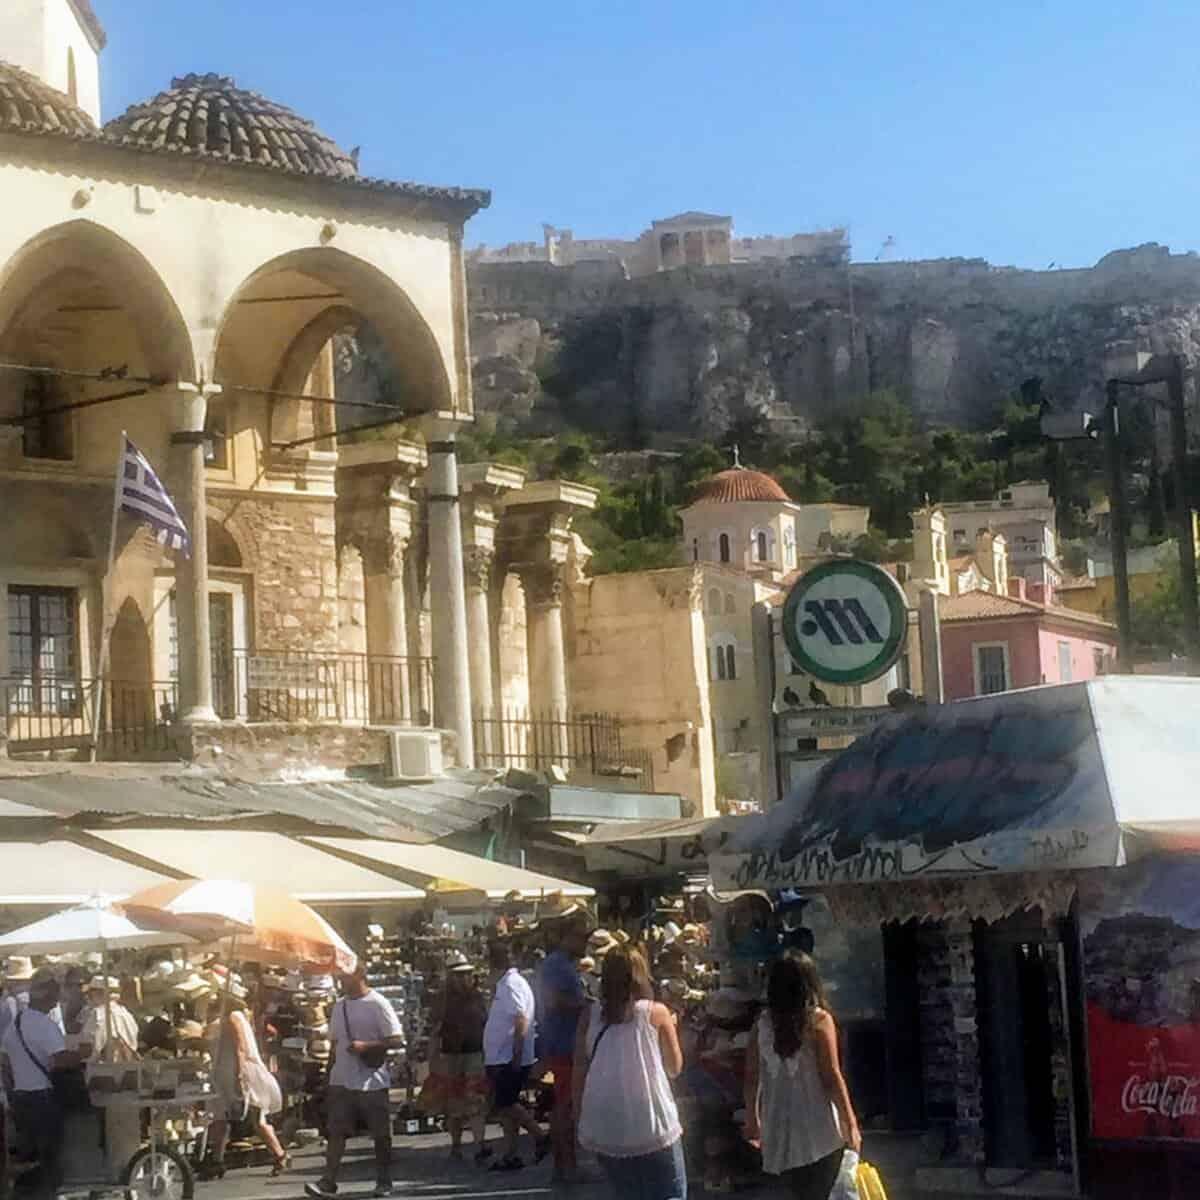 Monastiraki flee market in Athens Greece